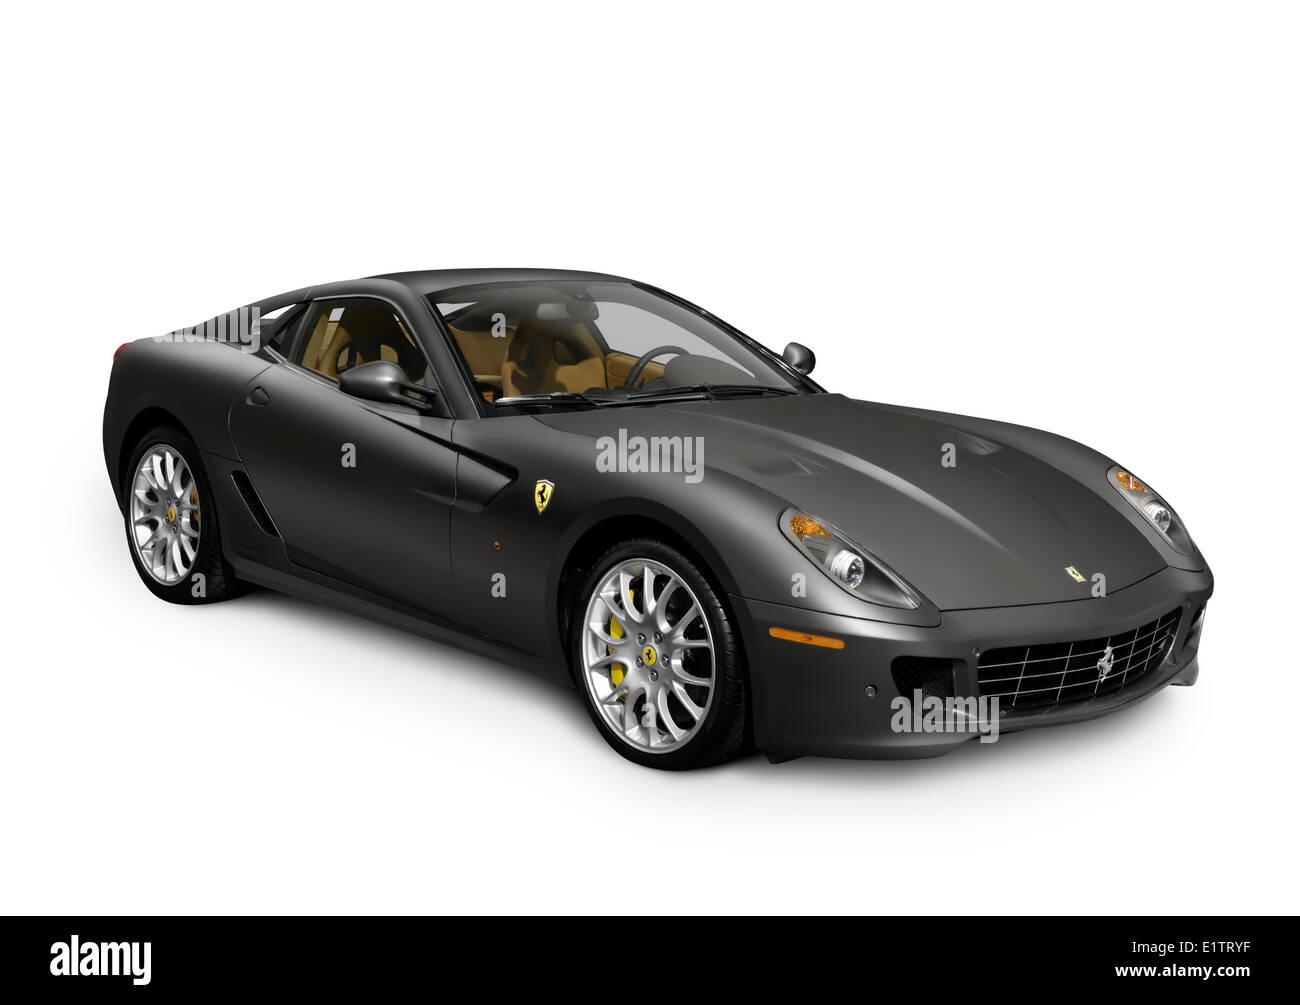 Gray Ferrari Fiorano 599 GTB Sports Car Isolated On White Background    Stock Image